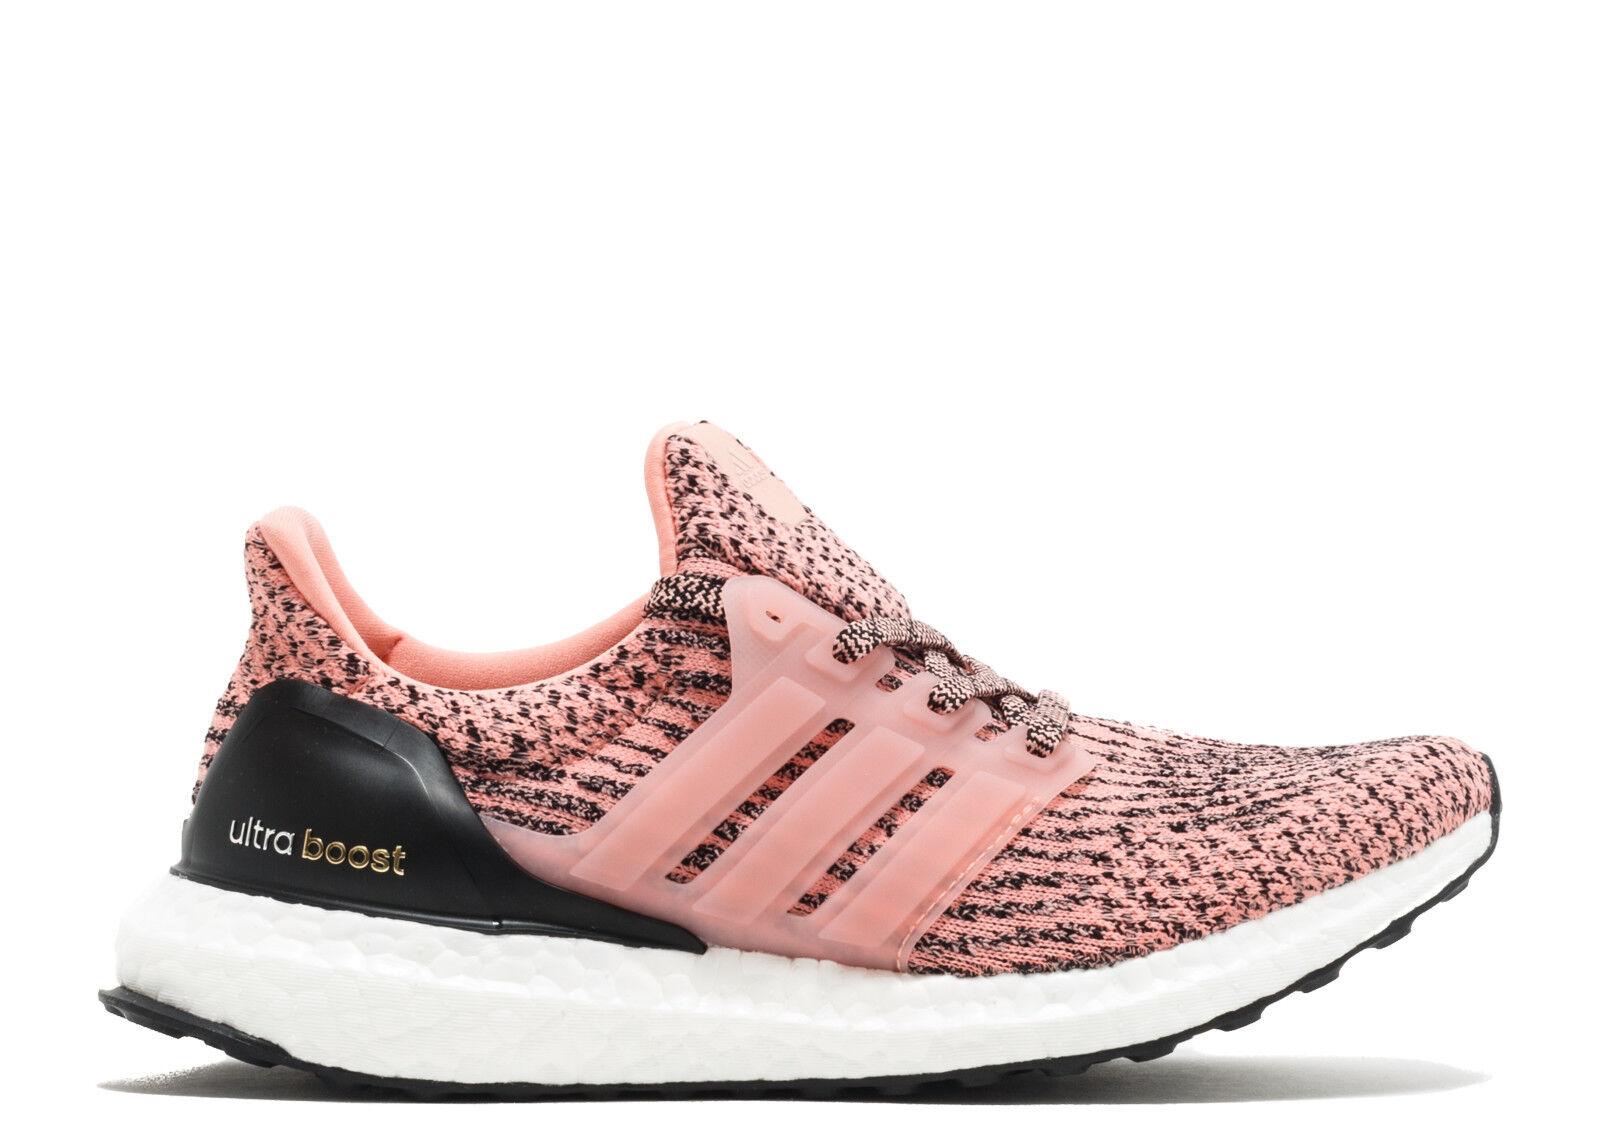 New  Adidas Ultra Boost Salmon Pink Still Breeze Women S80686 LIMITED